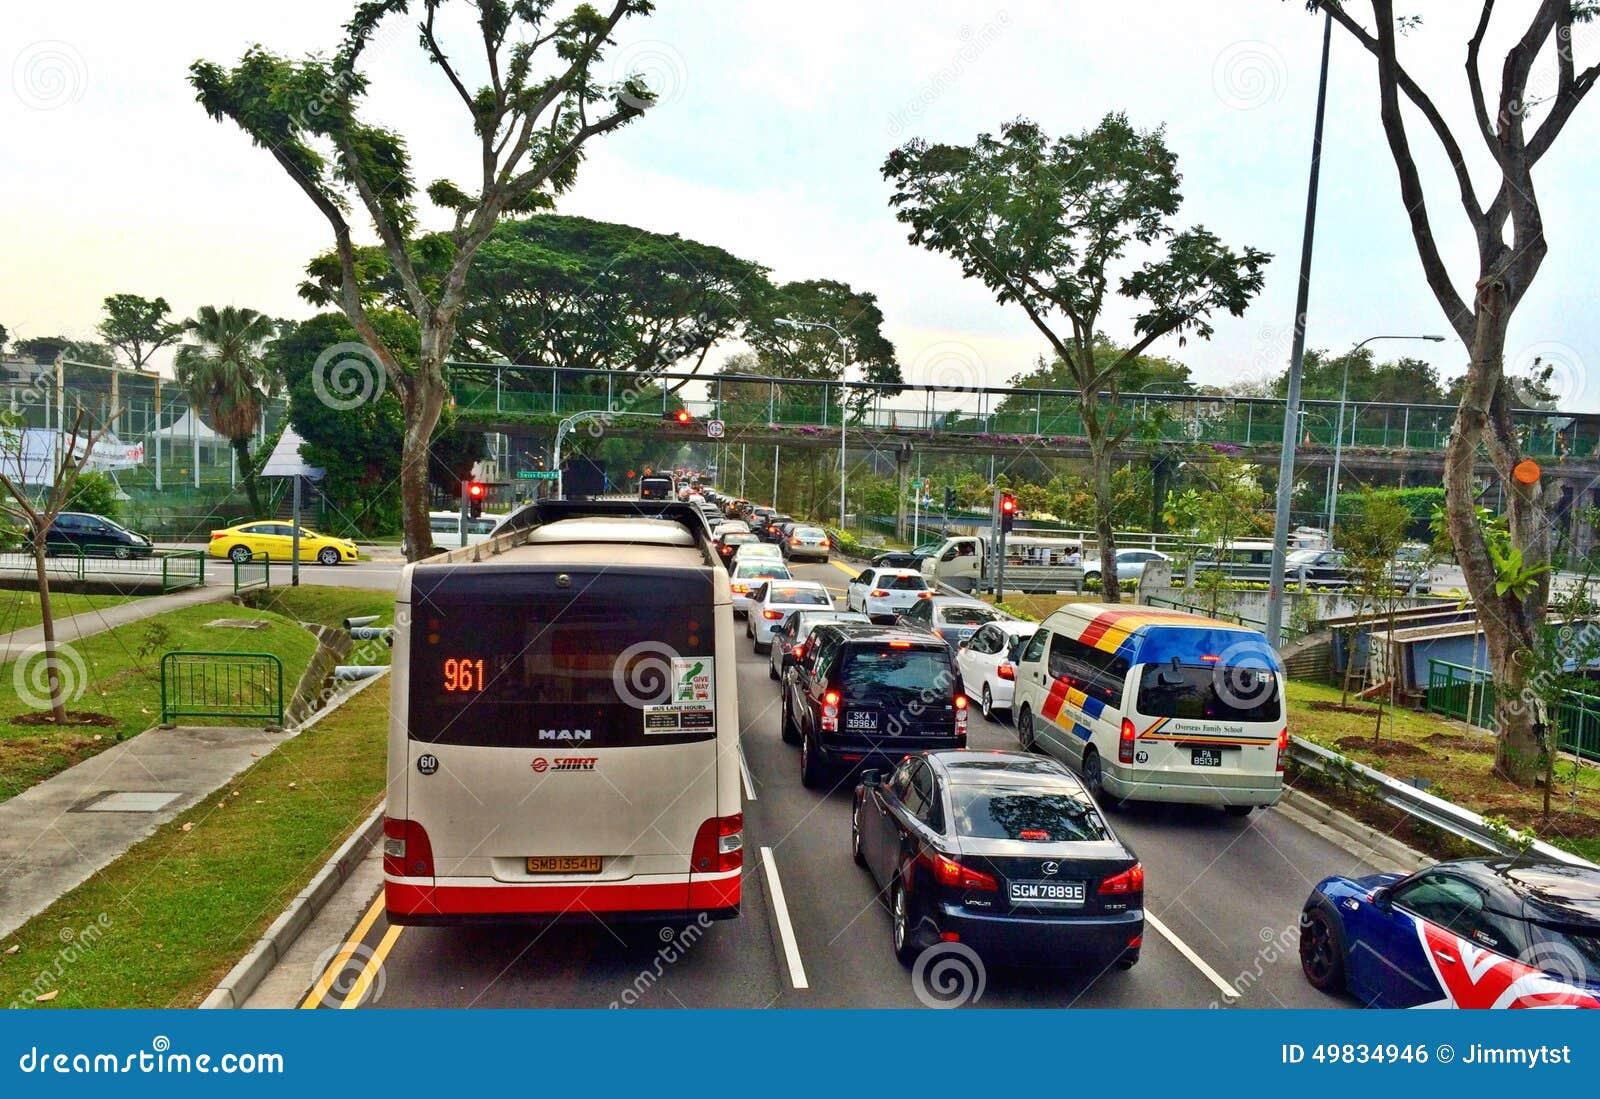 Verkehrsstockung entlang einer Hauptstraße in Singapur